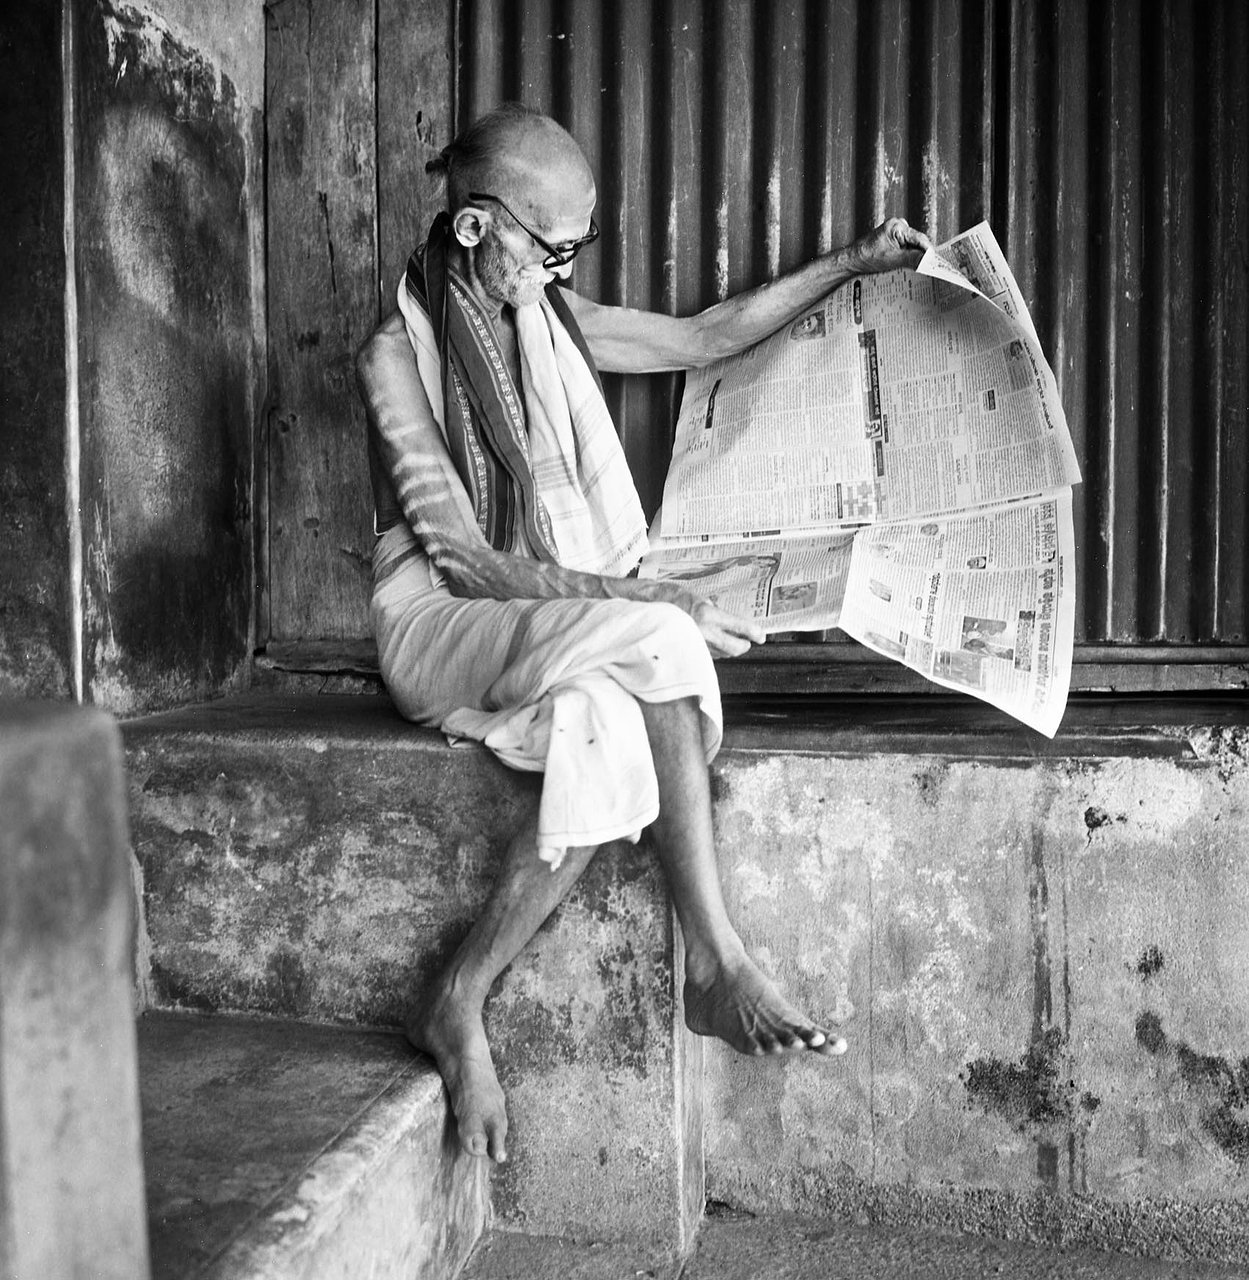 Brahmin priest, Gokarna